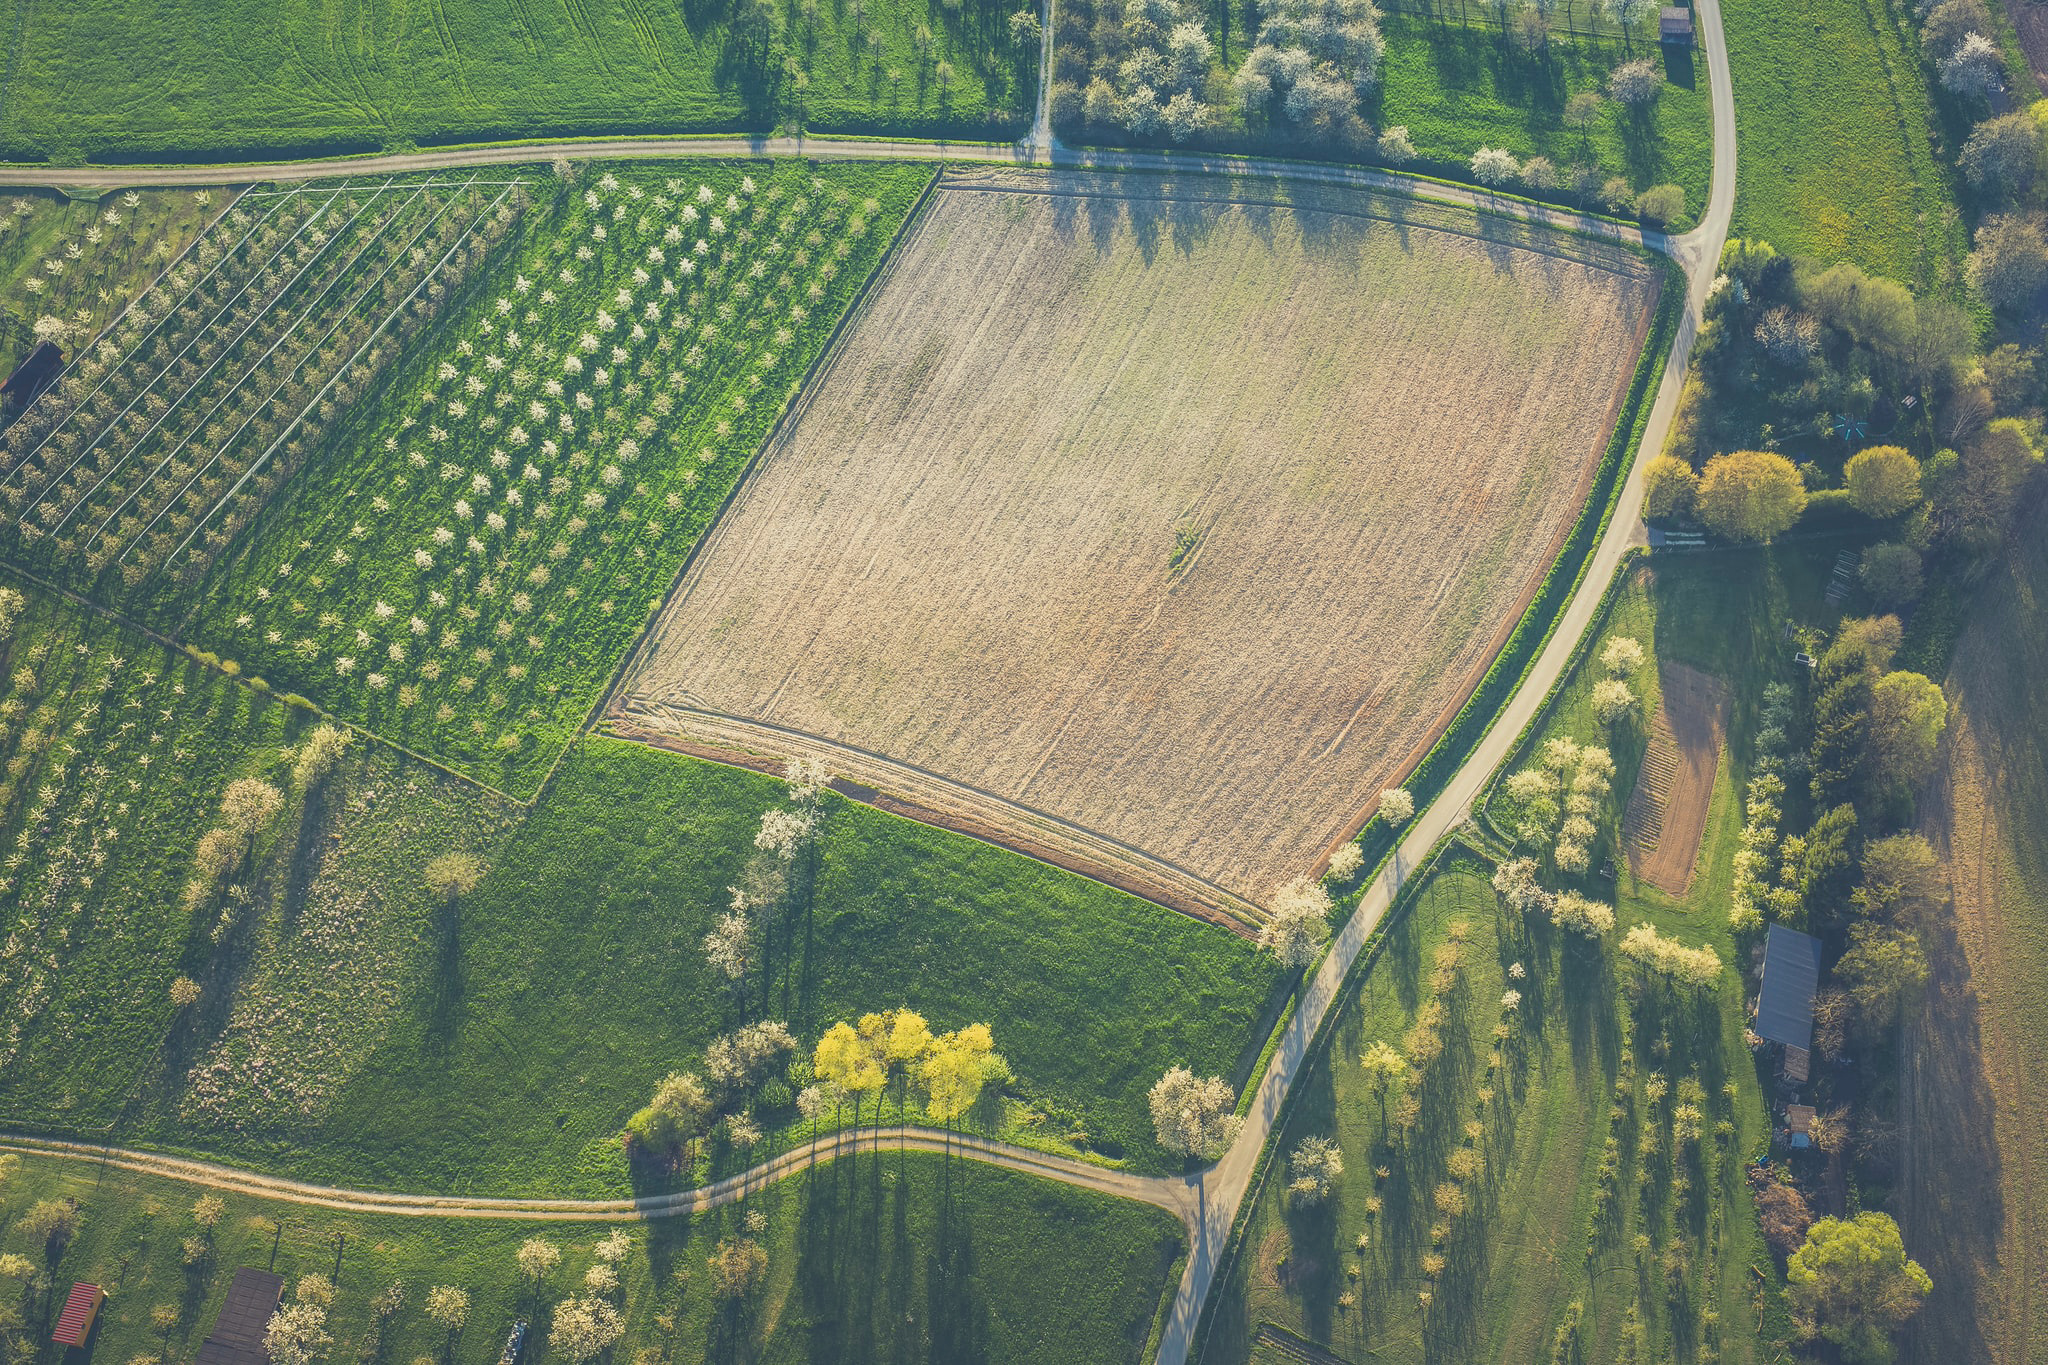 Bio-Remediation of Gasoline Contamination (Agricultural Property)